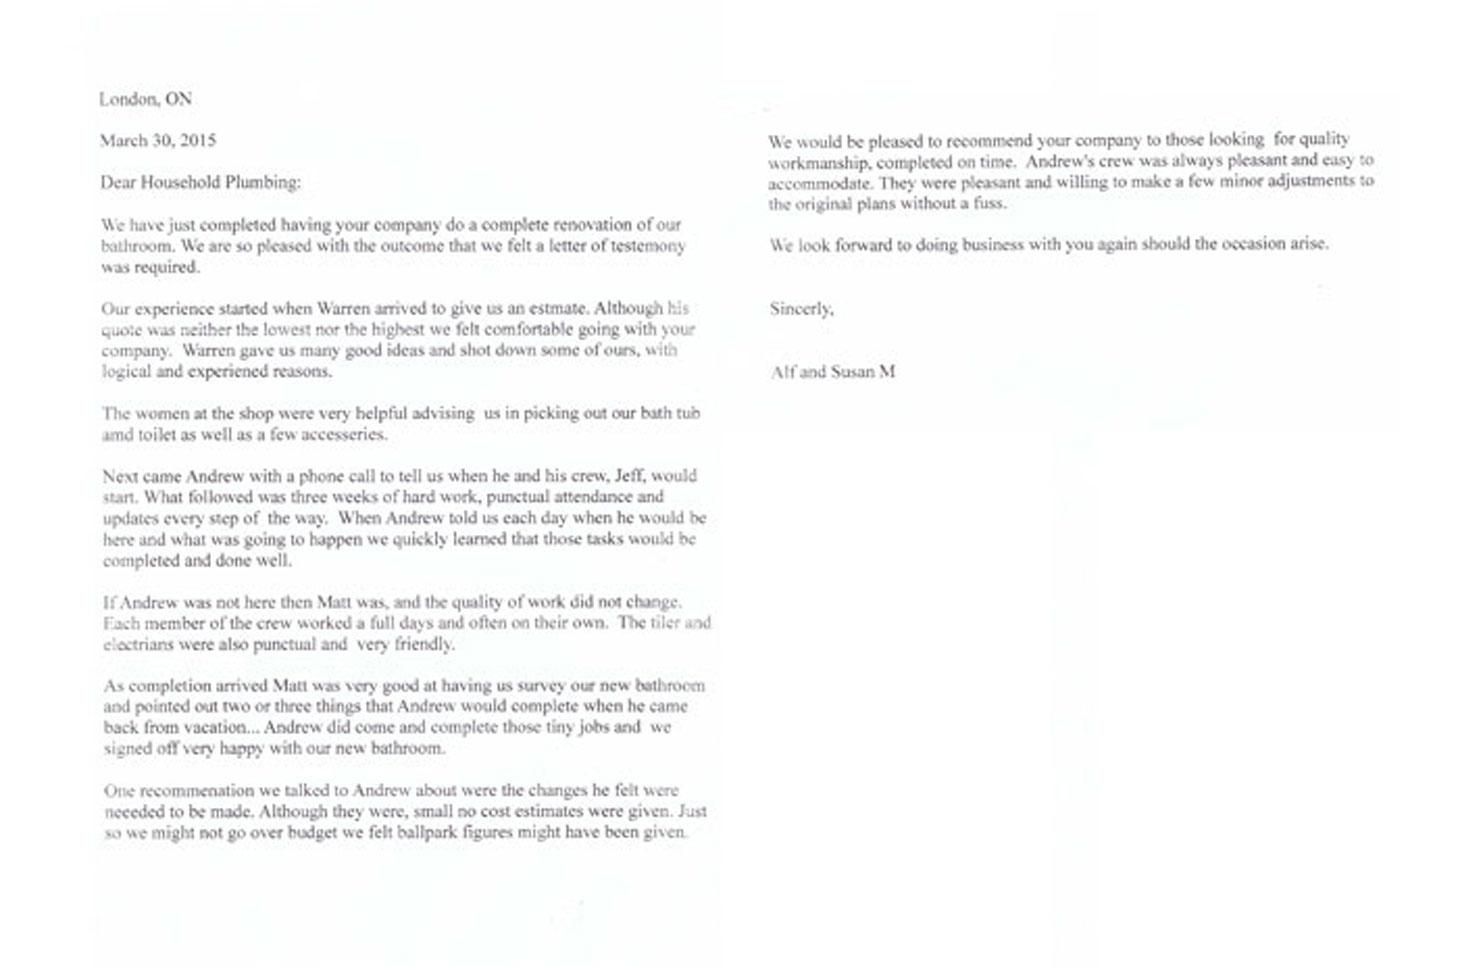 Alf-and-Susan-M-Testimonial